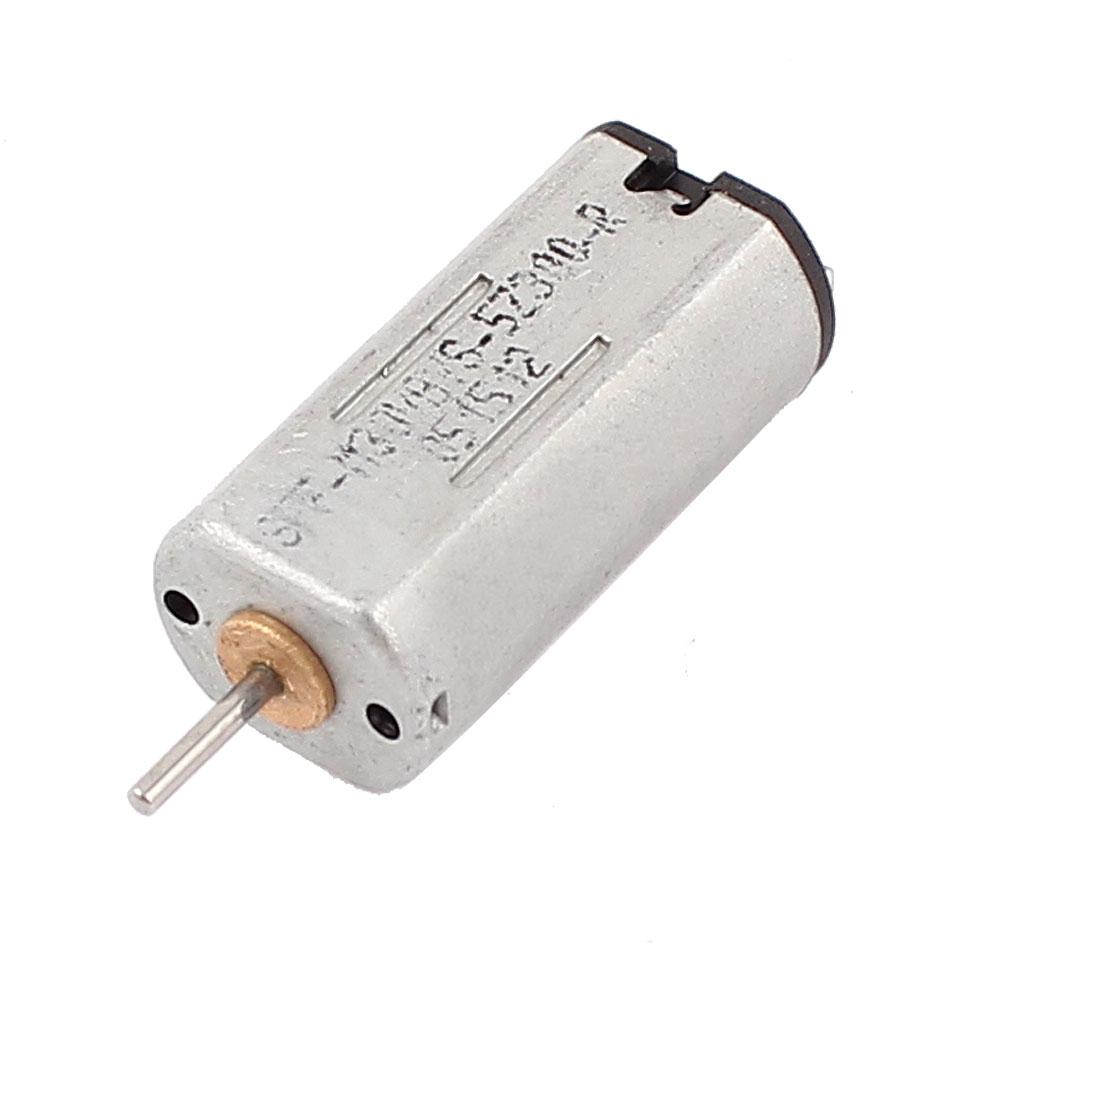 K30 DC 1.5-5.5V 10000RPM Output Speed Electric Mini Motor for DIY Robot Toys